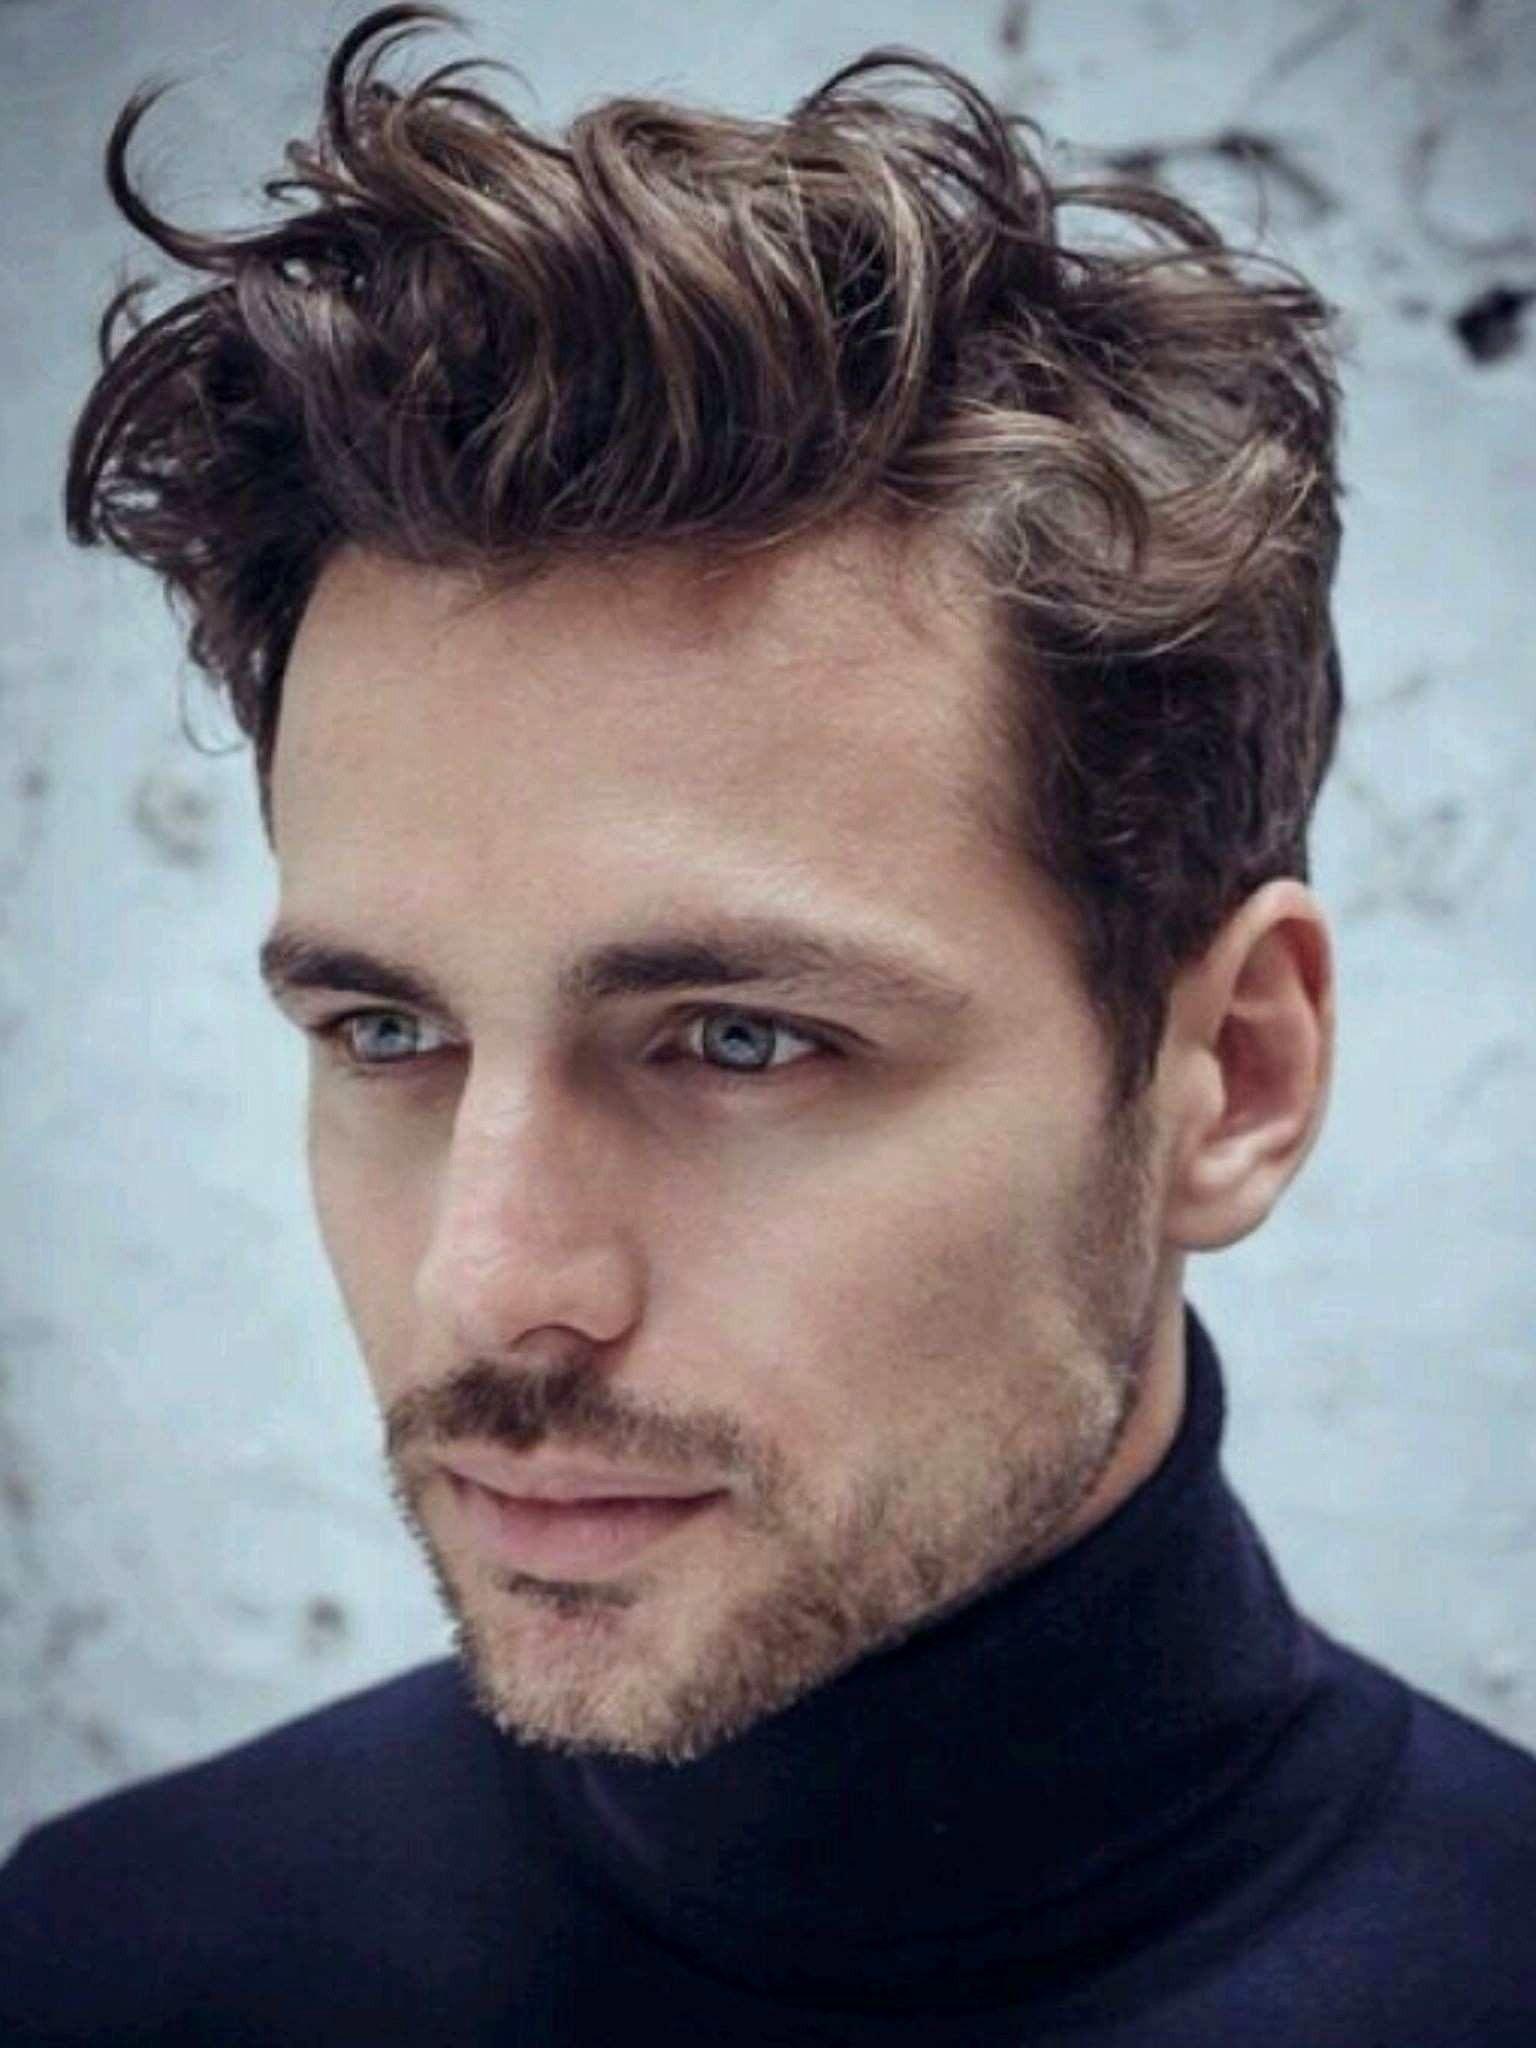 Wavy Hairstyles For Men Gallery In 2020 Wavy Hair Men Short Wavy Hair Pompadour Hairstyle